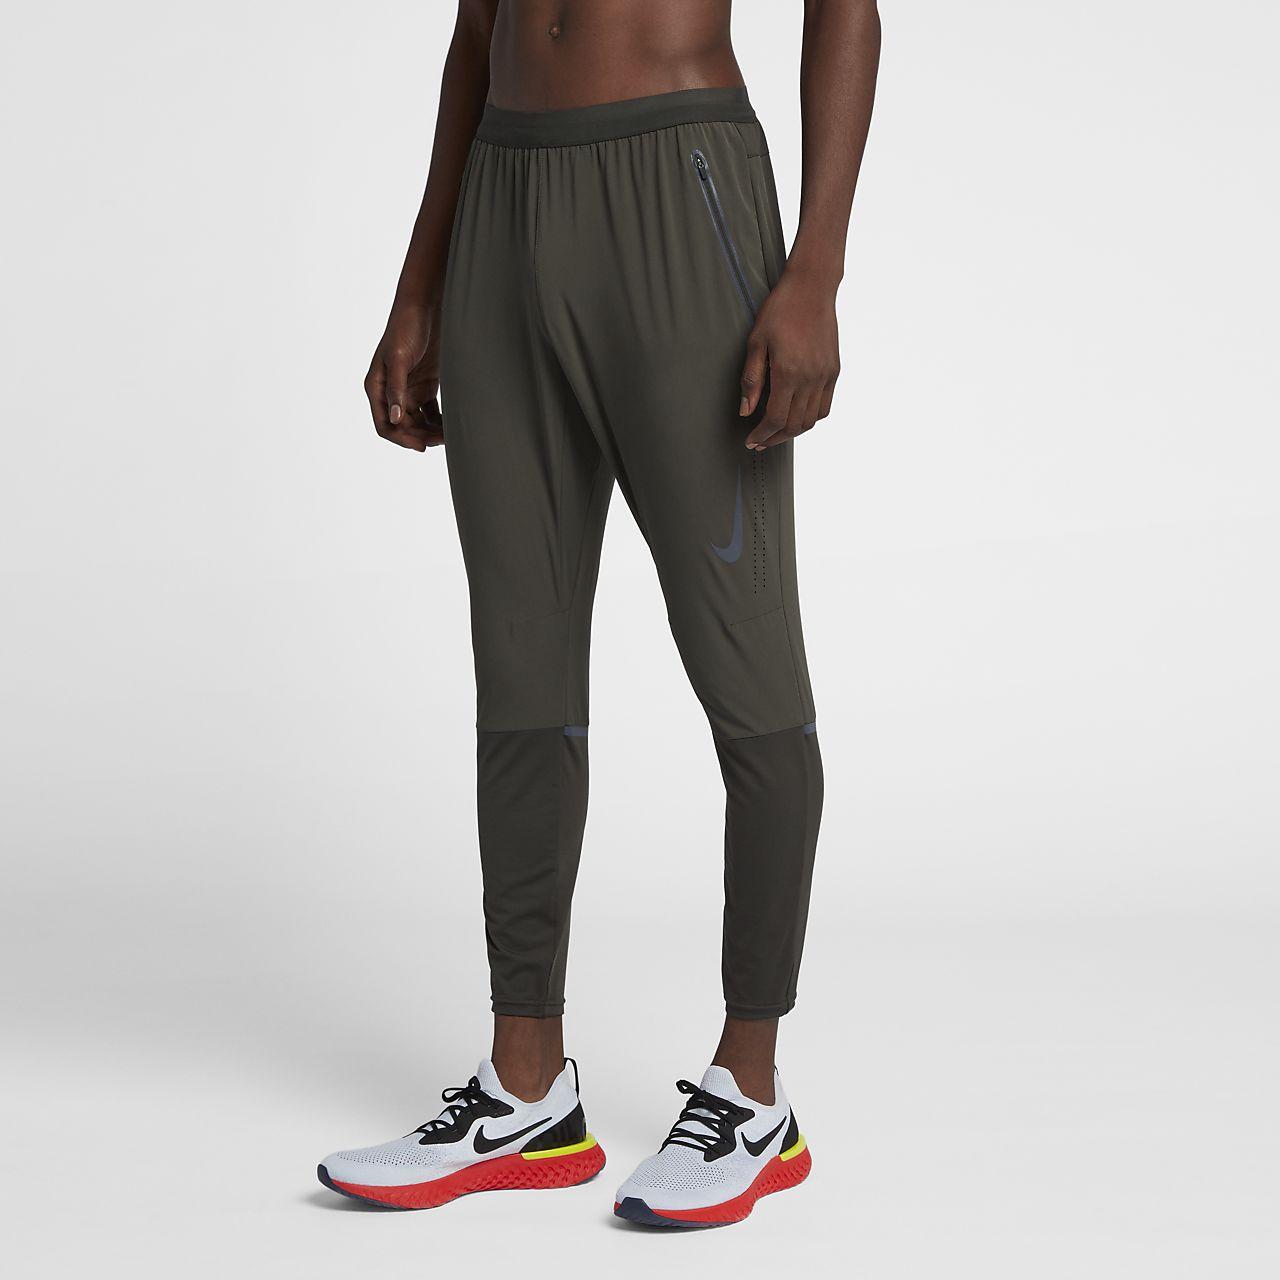 brand new a4e5c a5c26 ... Męskie spodnie do biegania Nike Swift